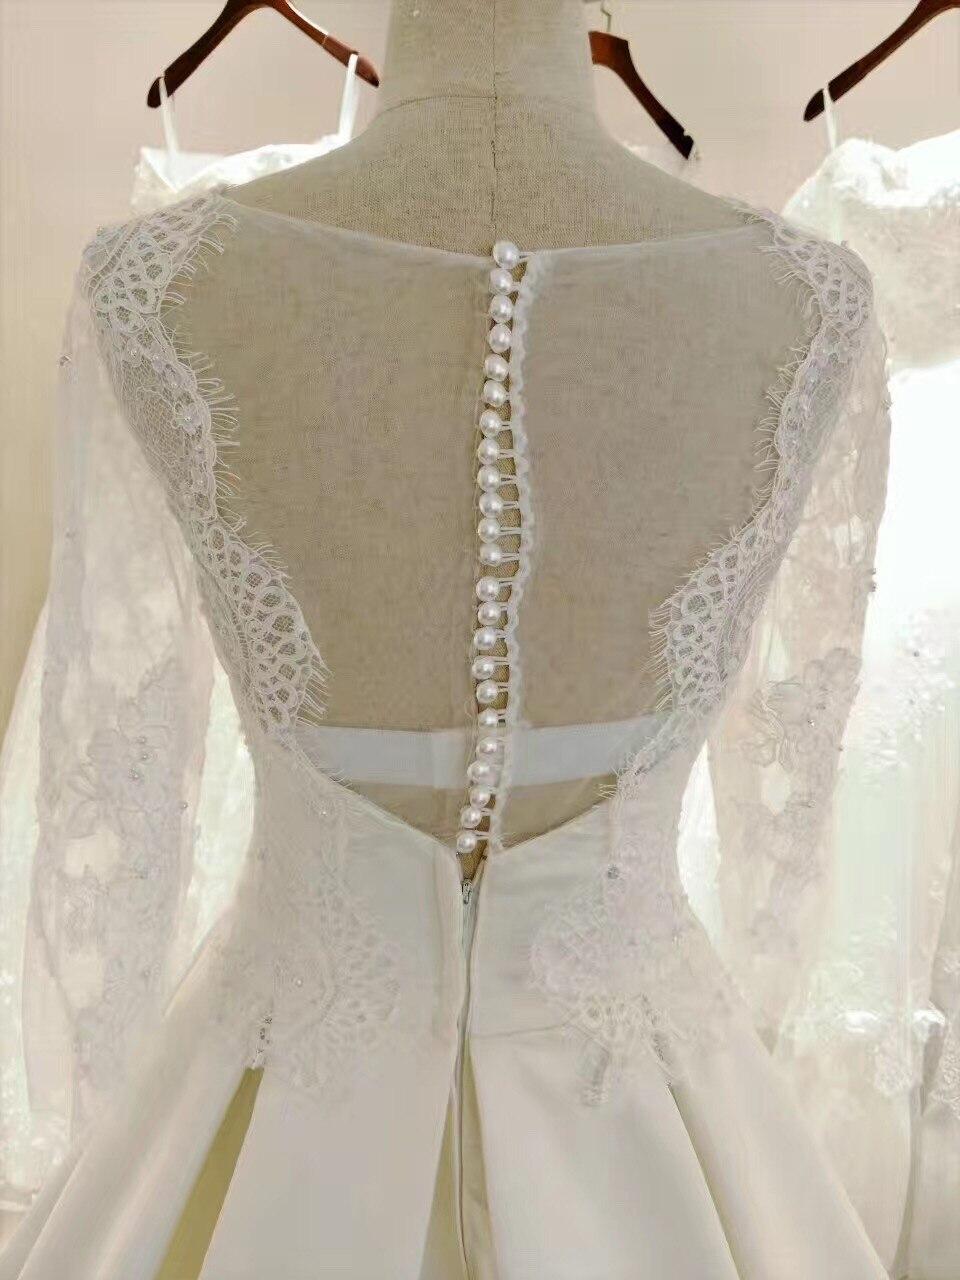 2017 New Wedding Dress Beading Pearls Button Beautiful Lace Chic ...